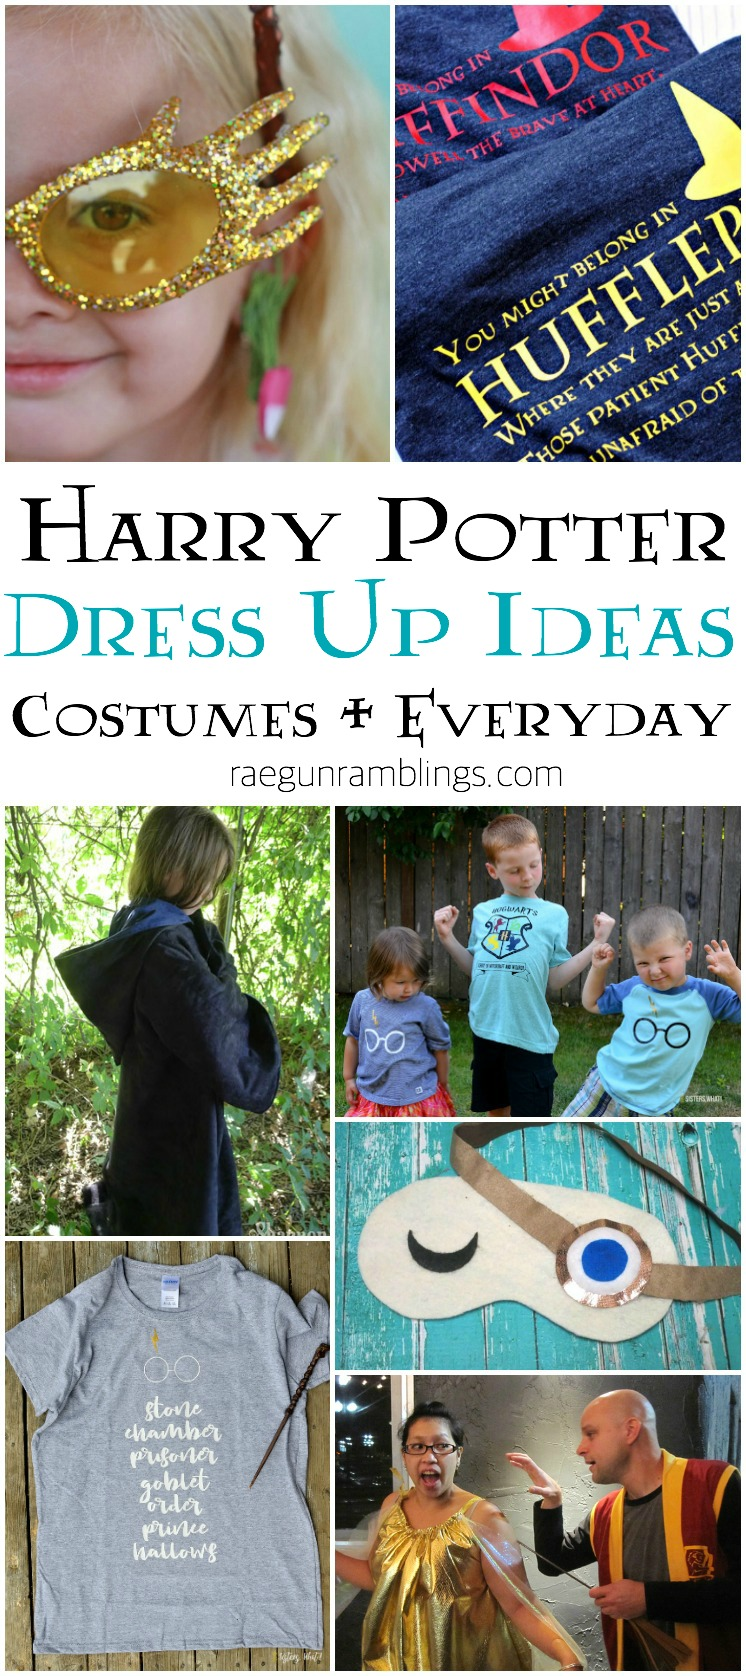 DIY harry potter dress up and costume tutorials